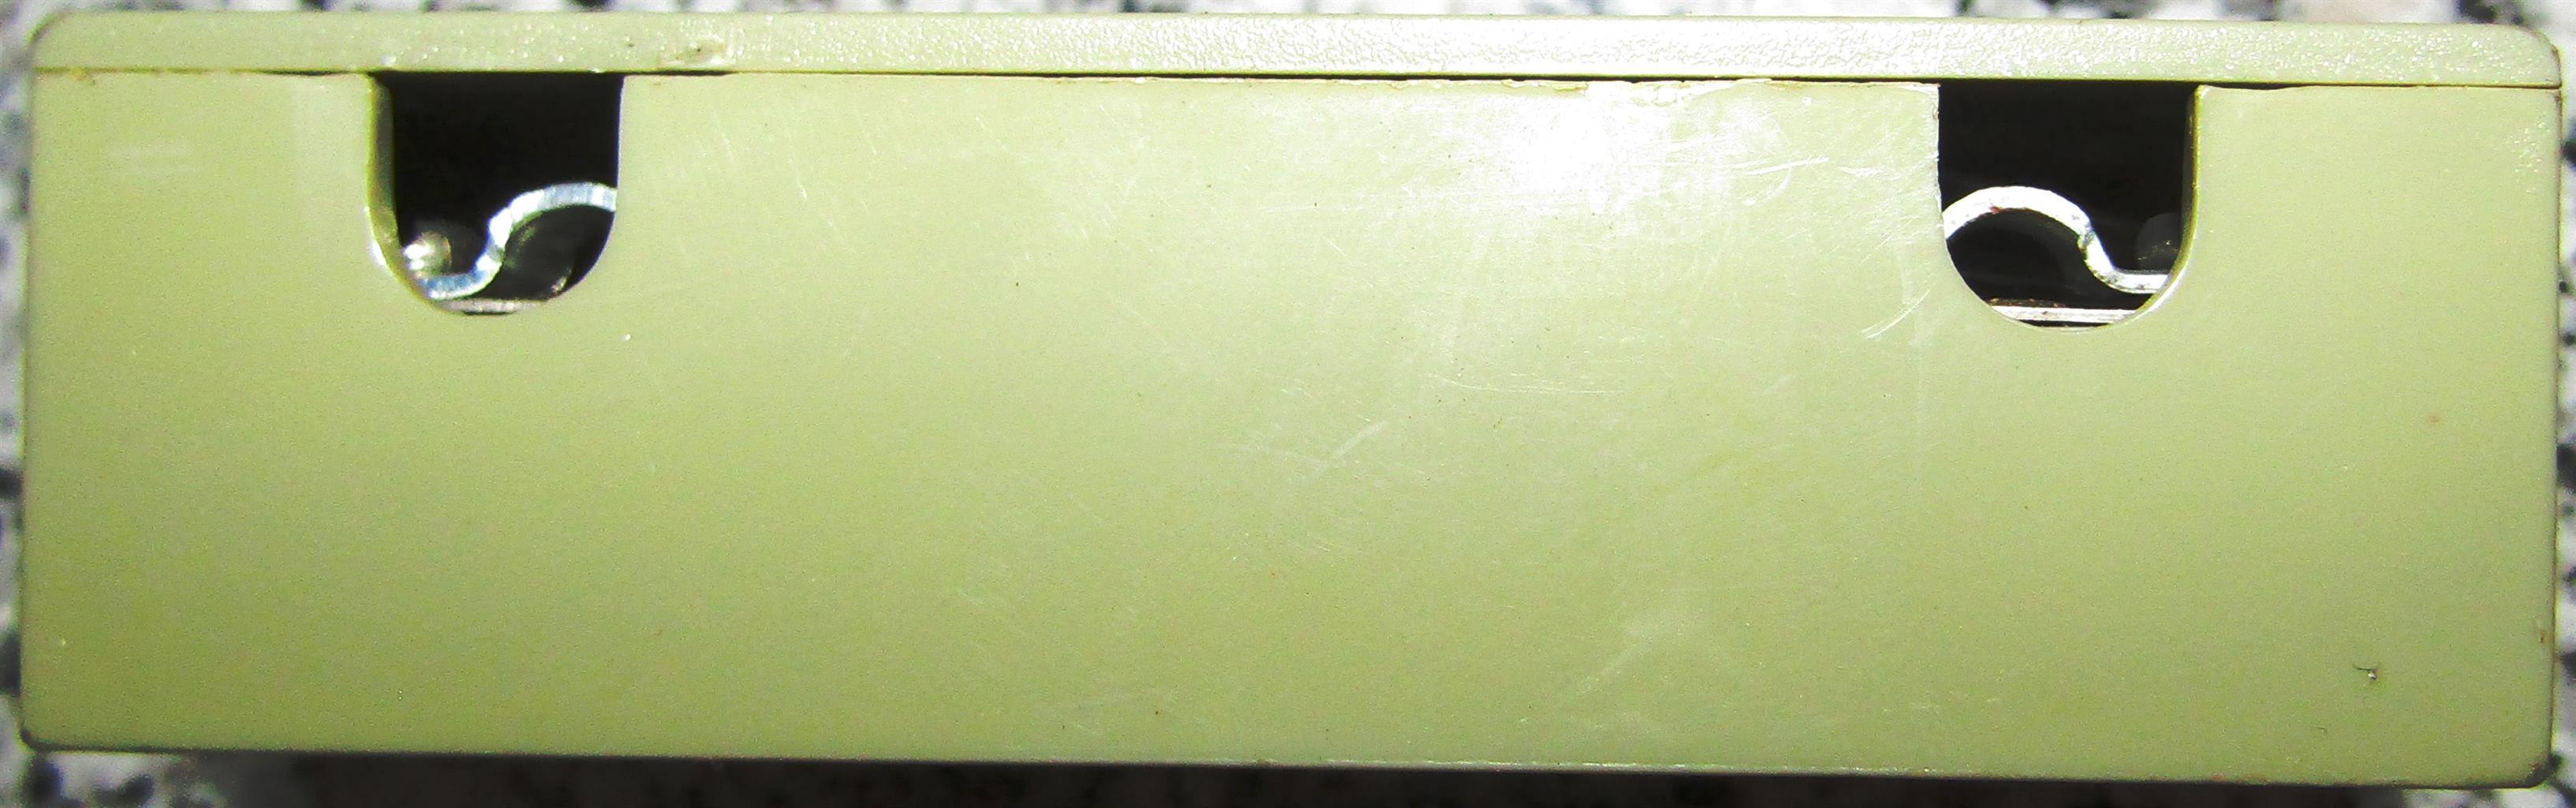 Ellies VSP-3224 U/V/FM 4-Way Splitter